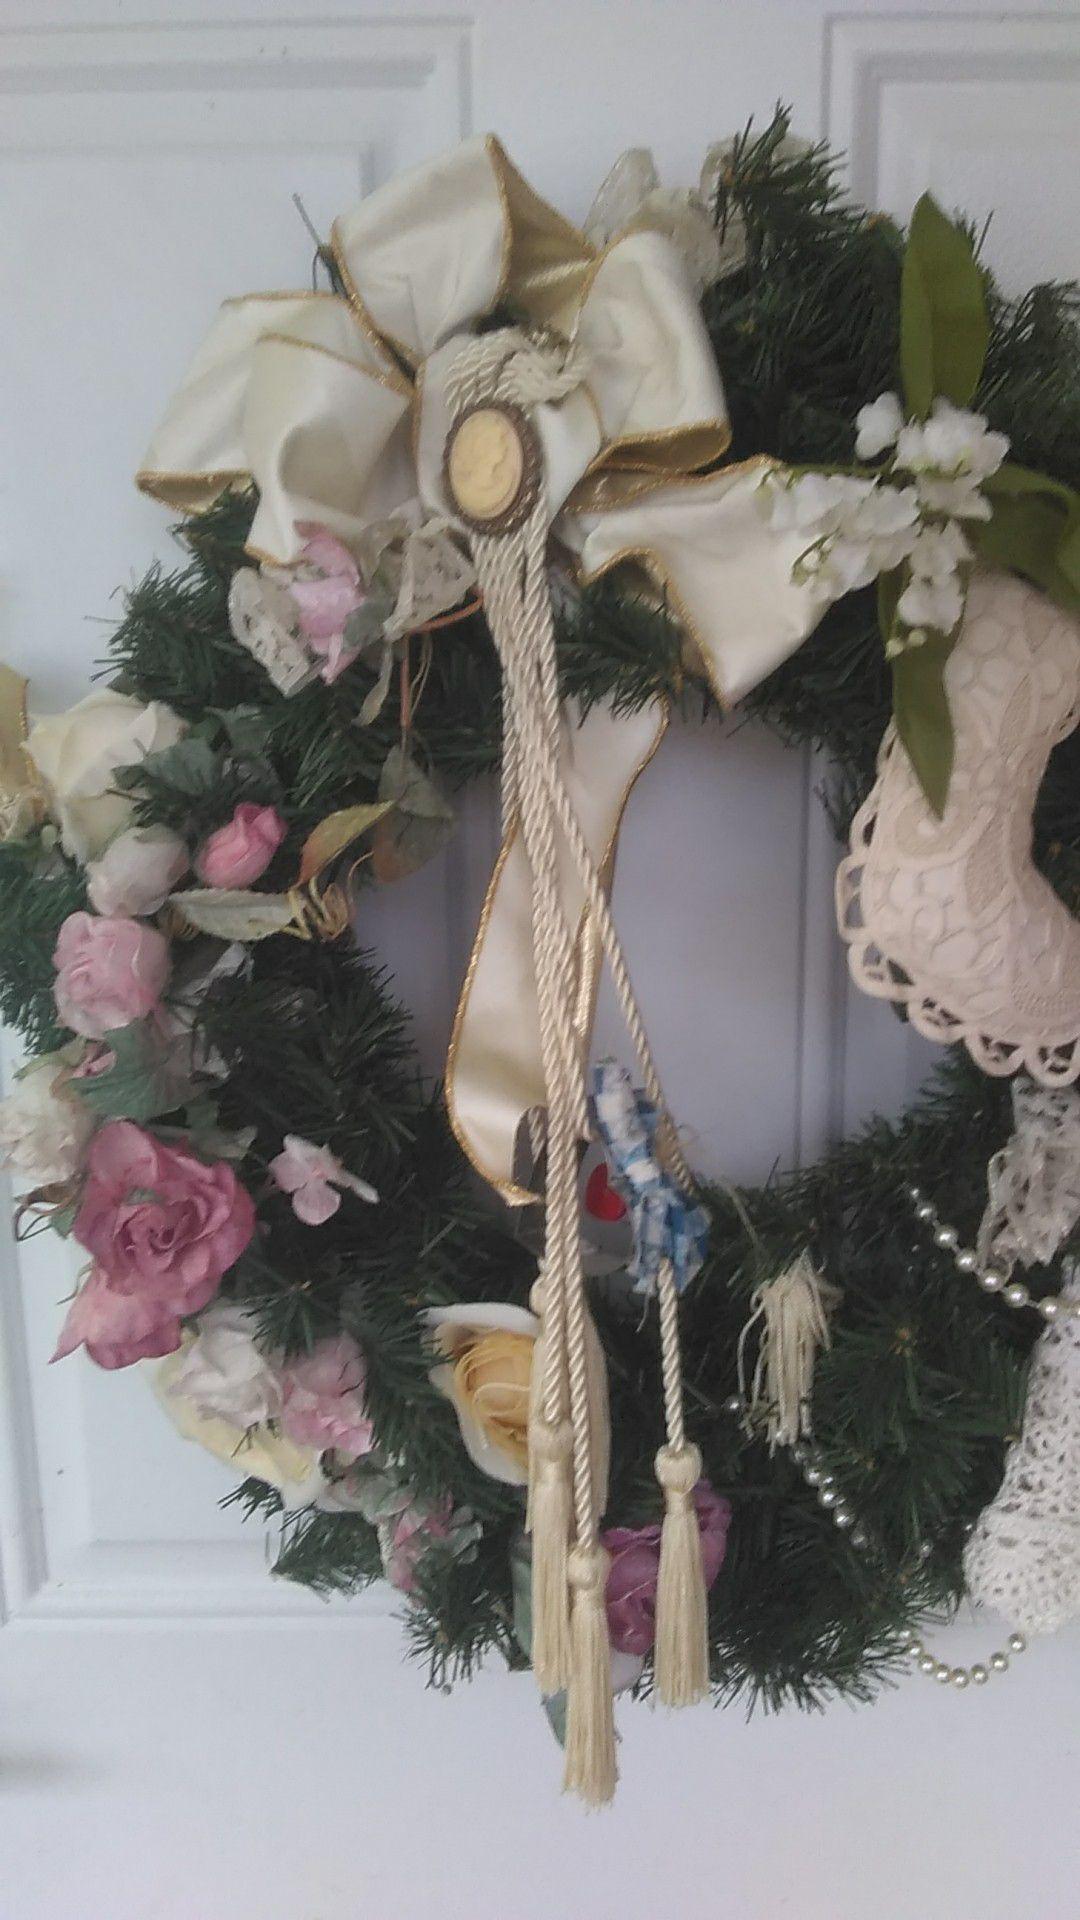 Home made Wreath.